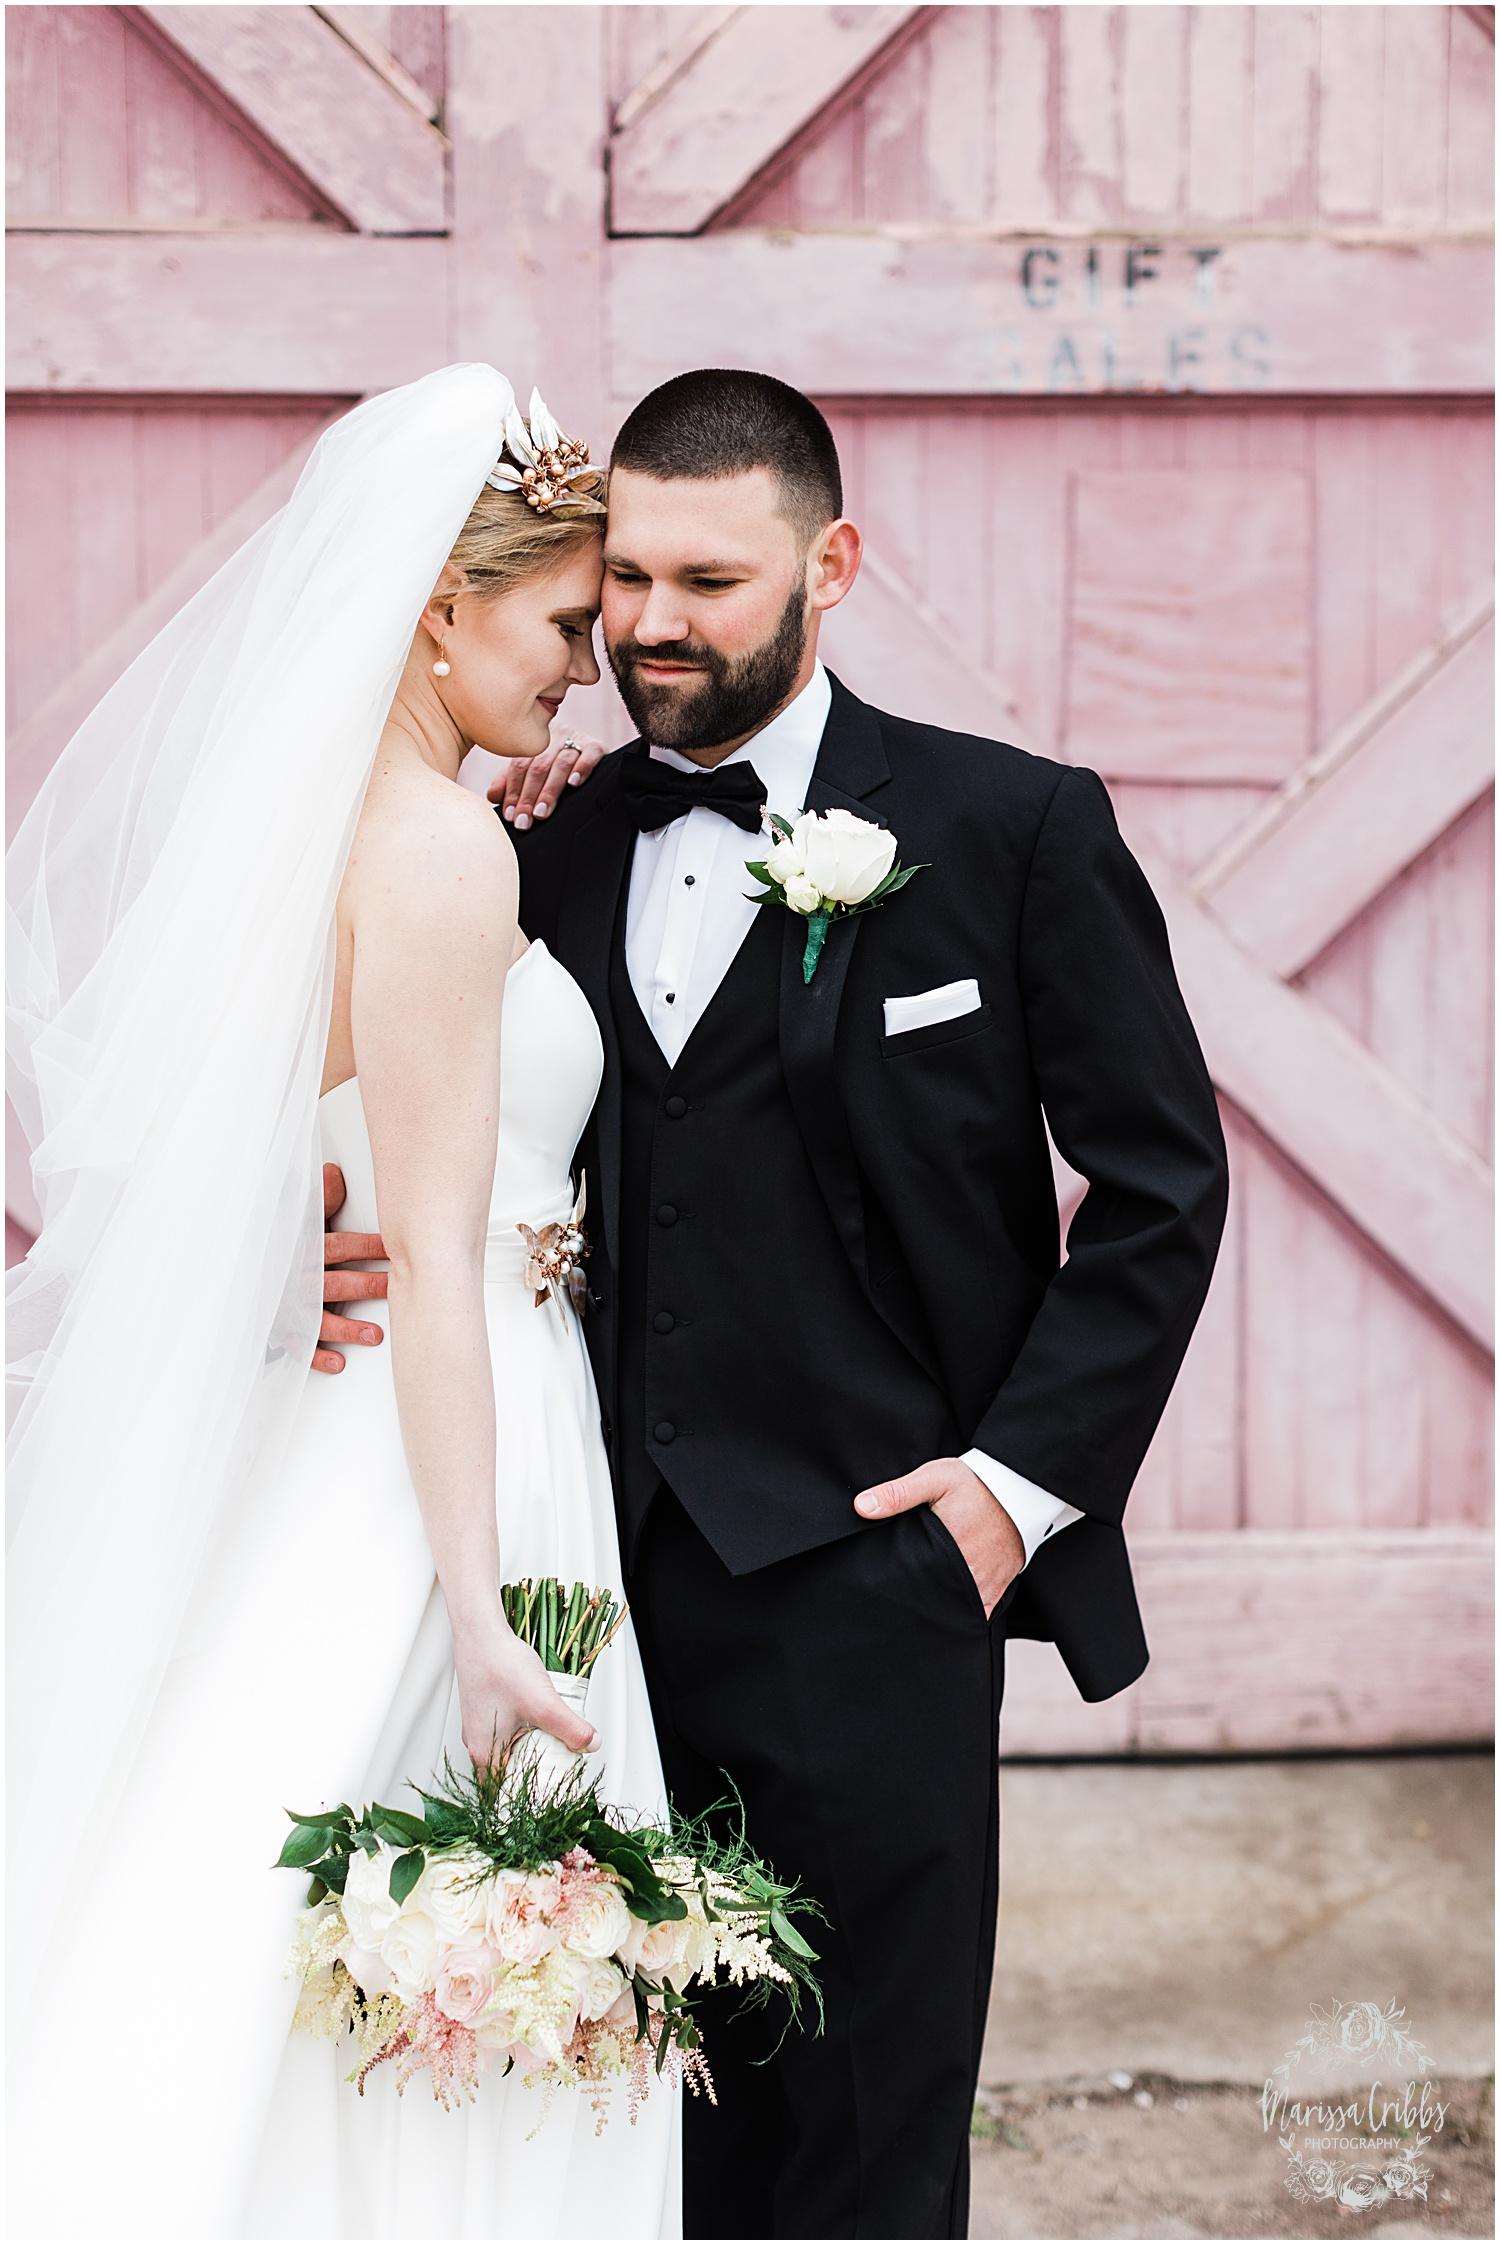 ABBY & CHARLIE WEDDING   THE HUDSON EVENT SPACE WEDDING   MARISSA CRIBBS PHOTOGRAPHY_7542.jpg